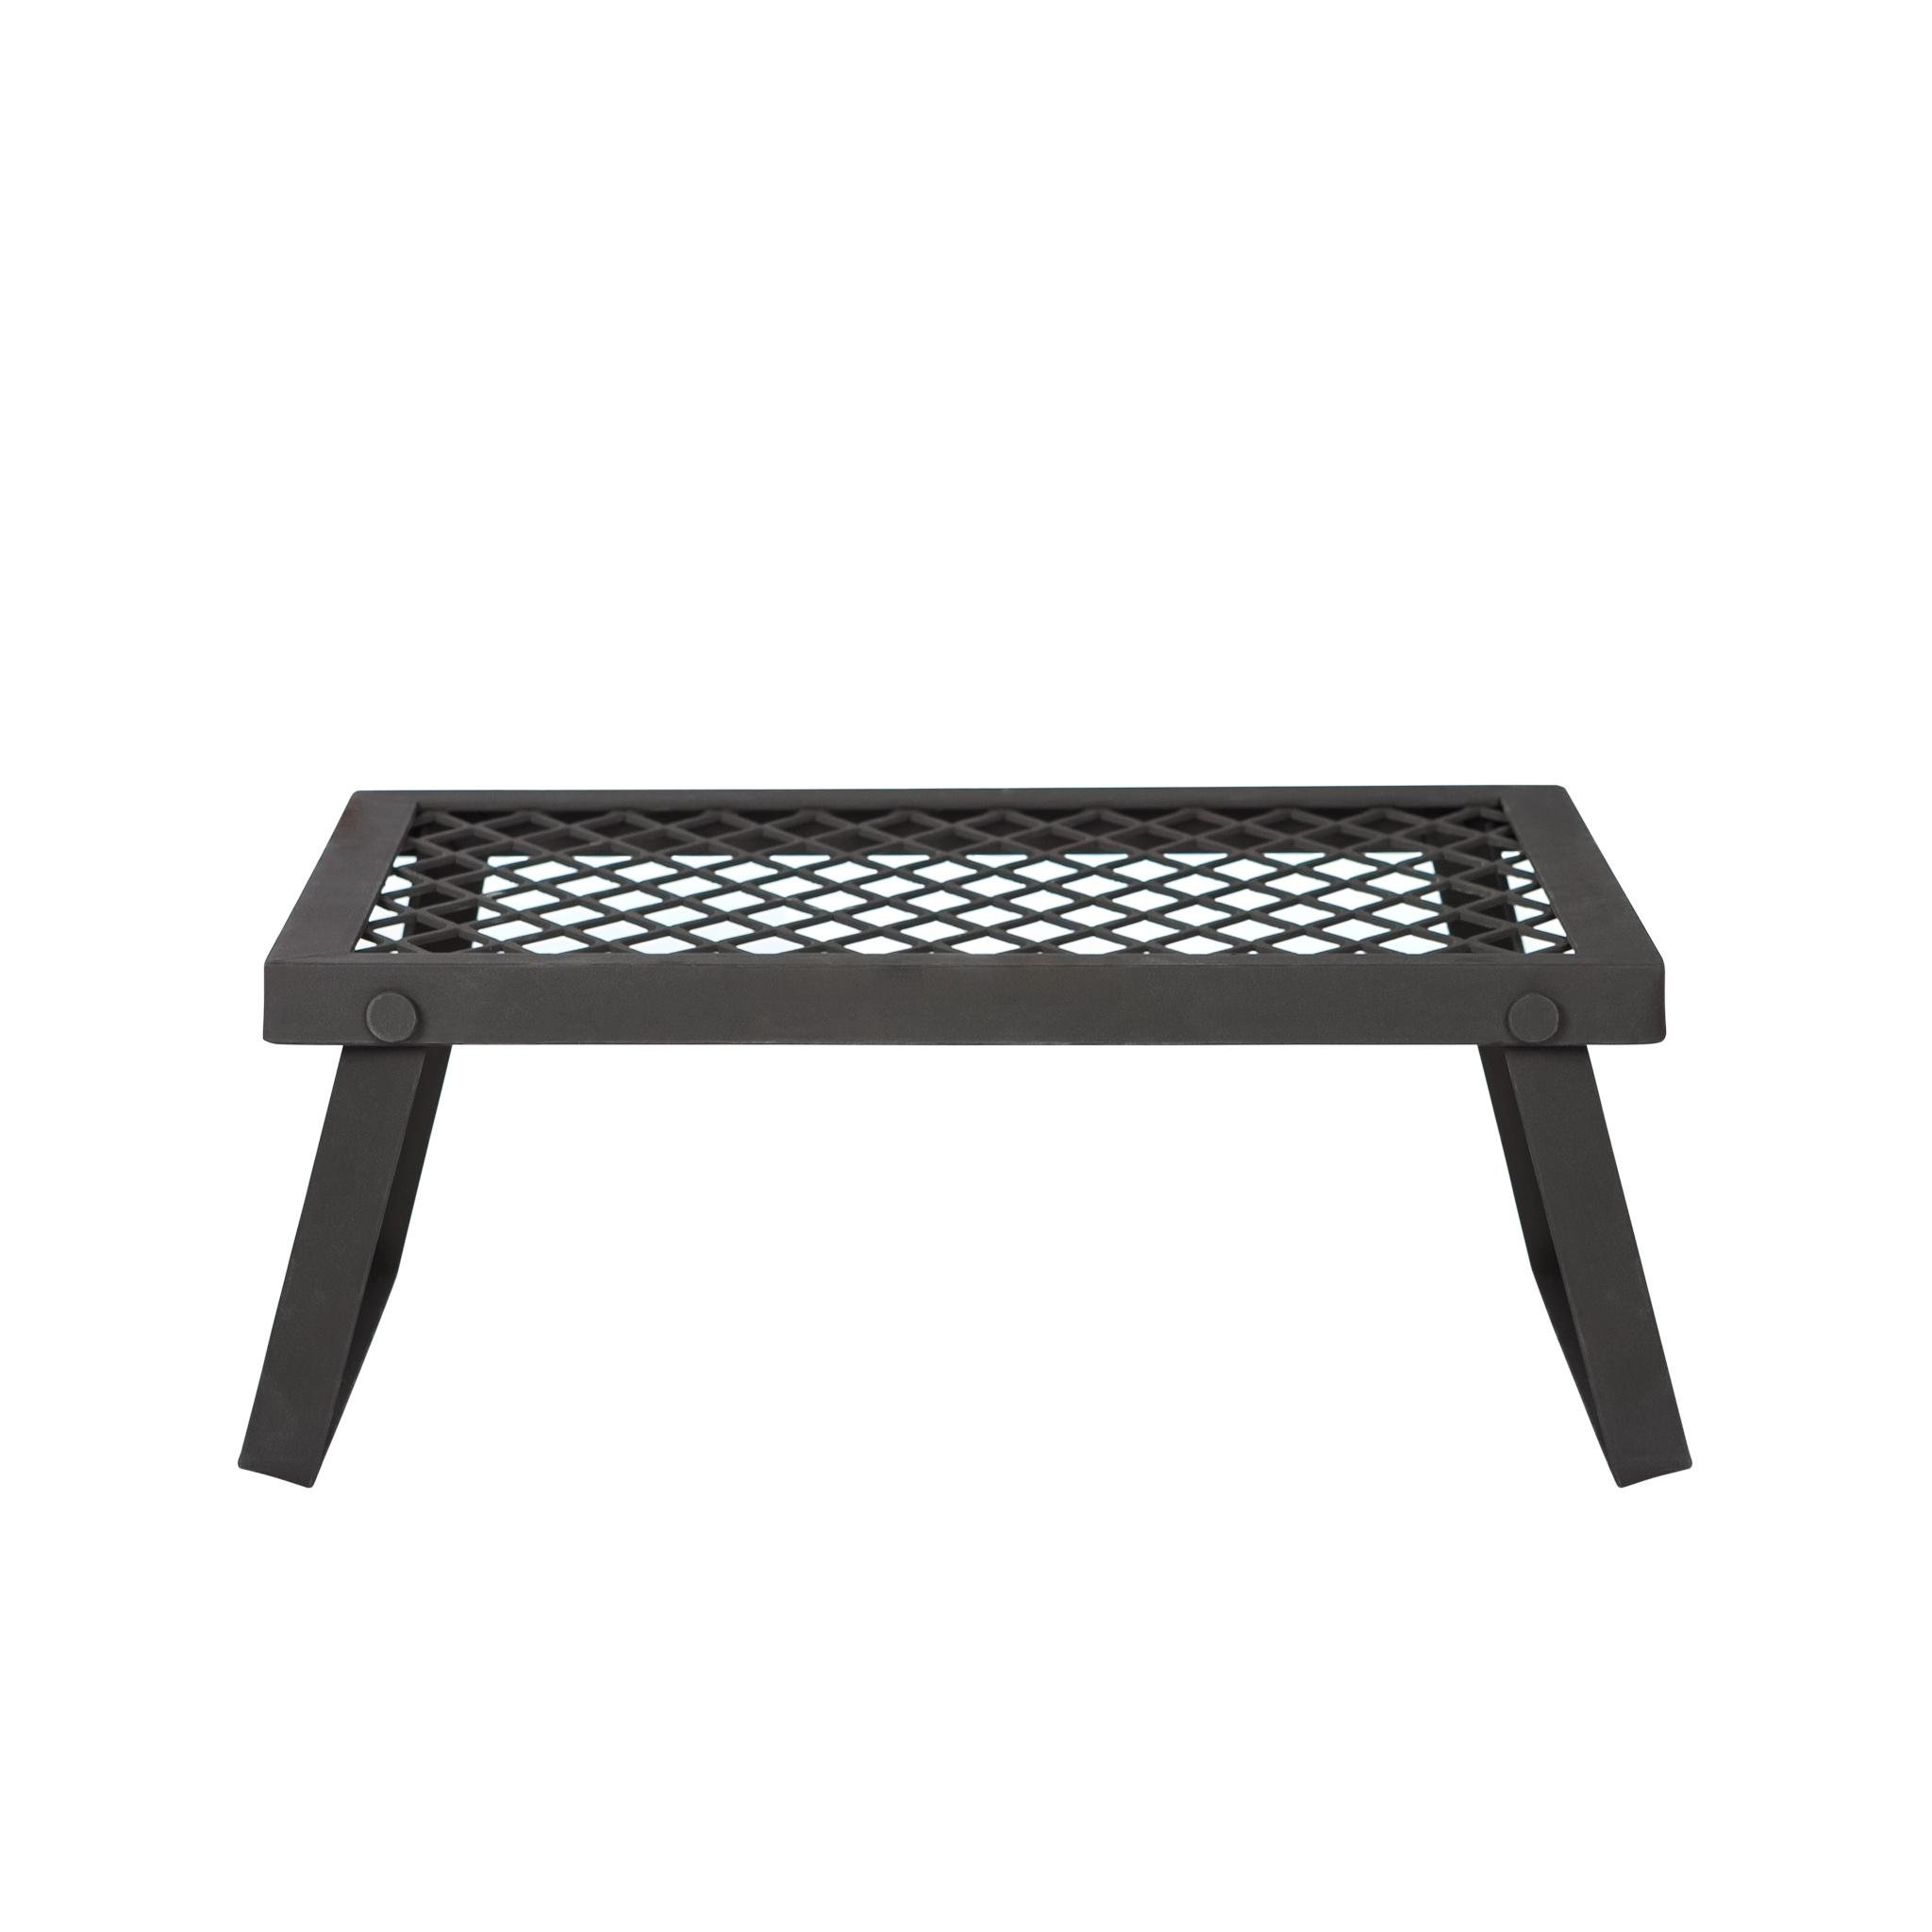 Amazon Basics Portable Outdoor Folding Campfire Grill